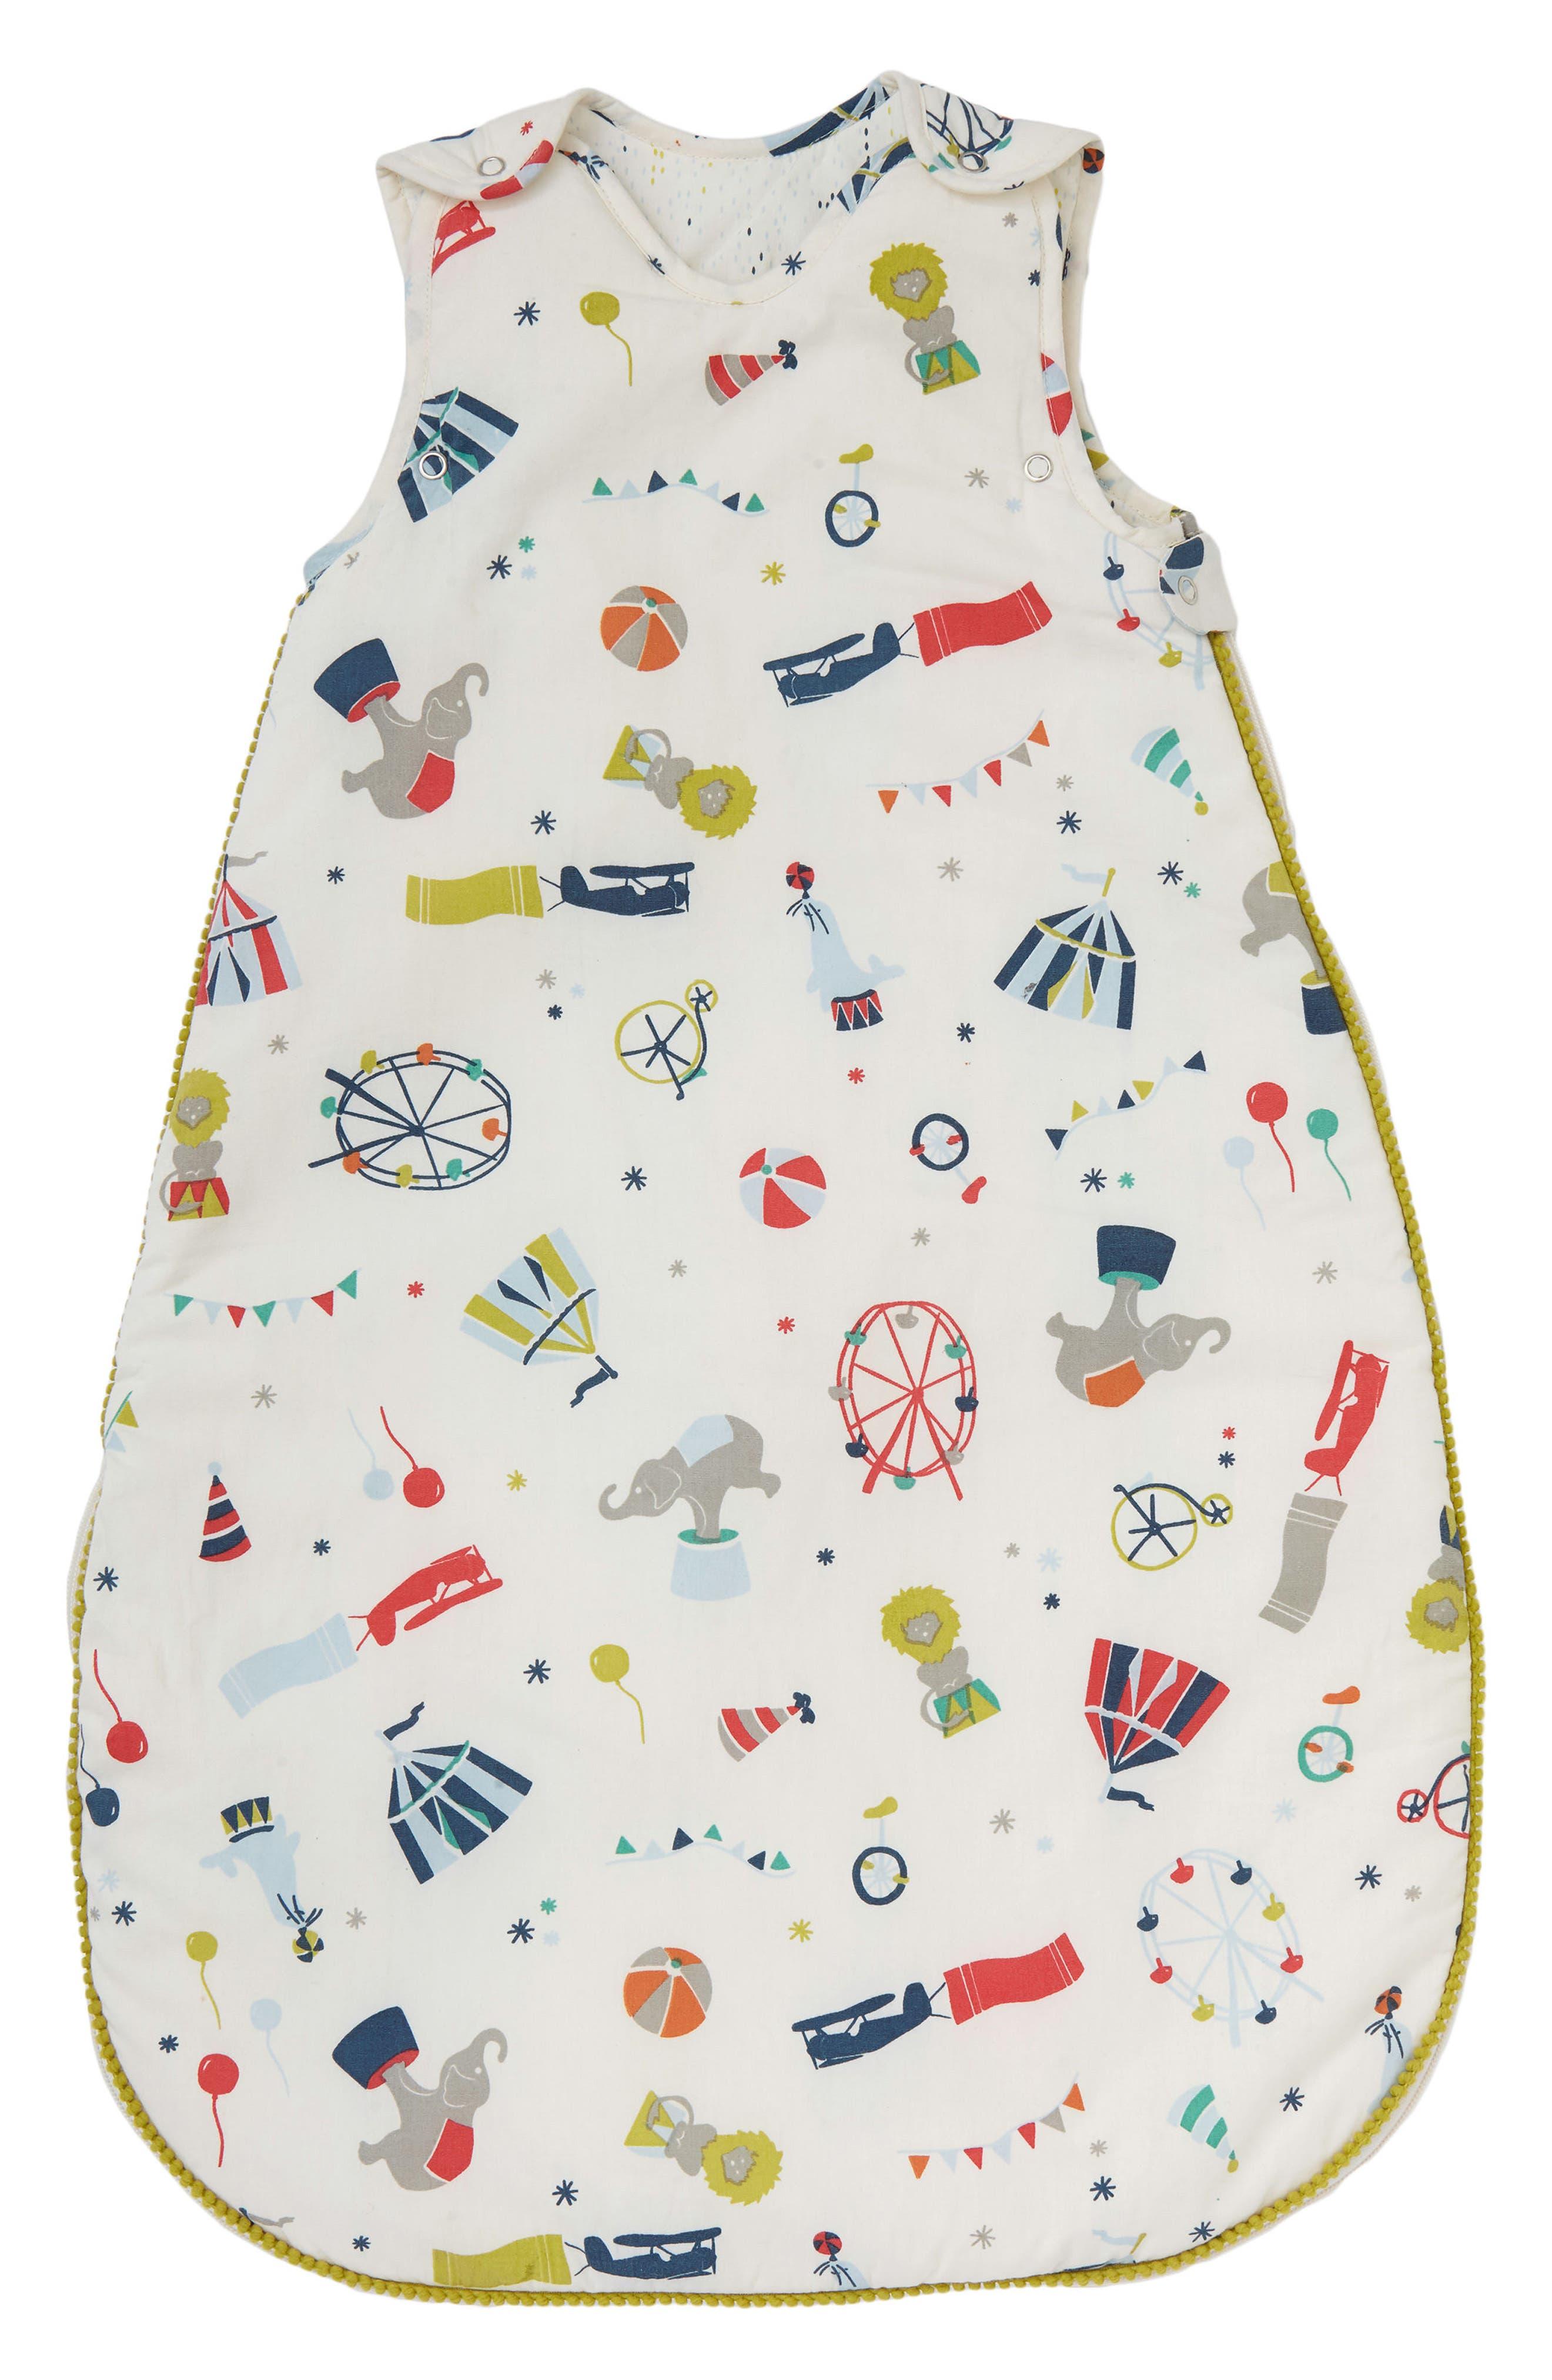 Big Top Print Cotton Wearable Blanket,                             Main thumbnail 1, color,                             450